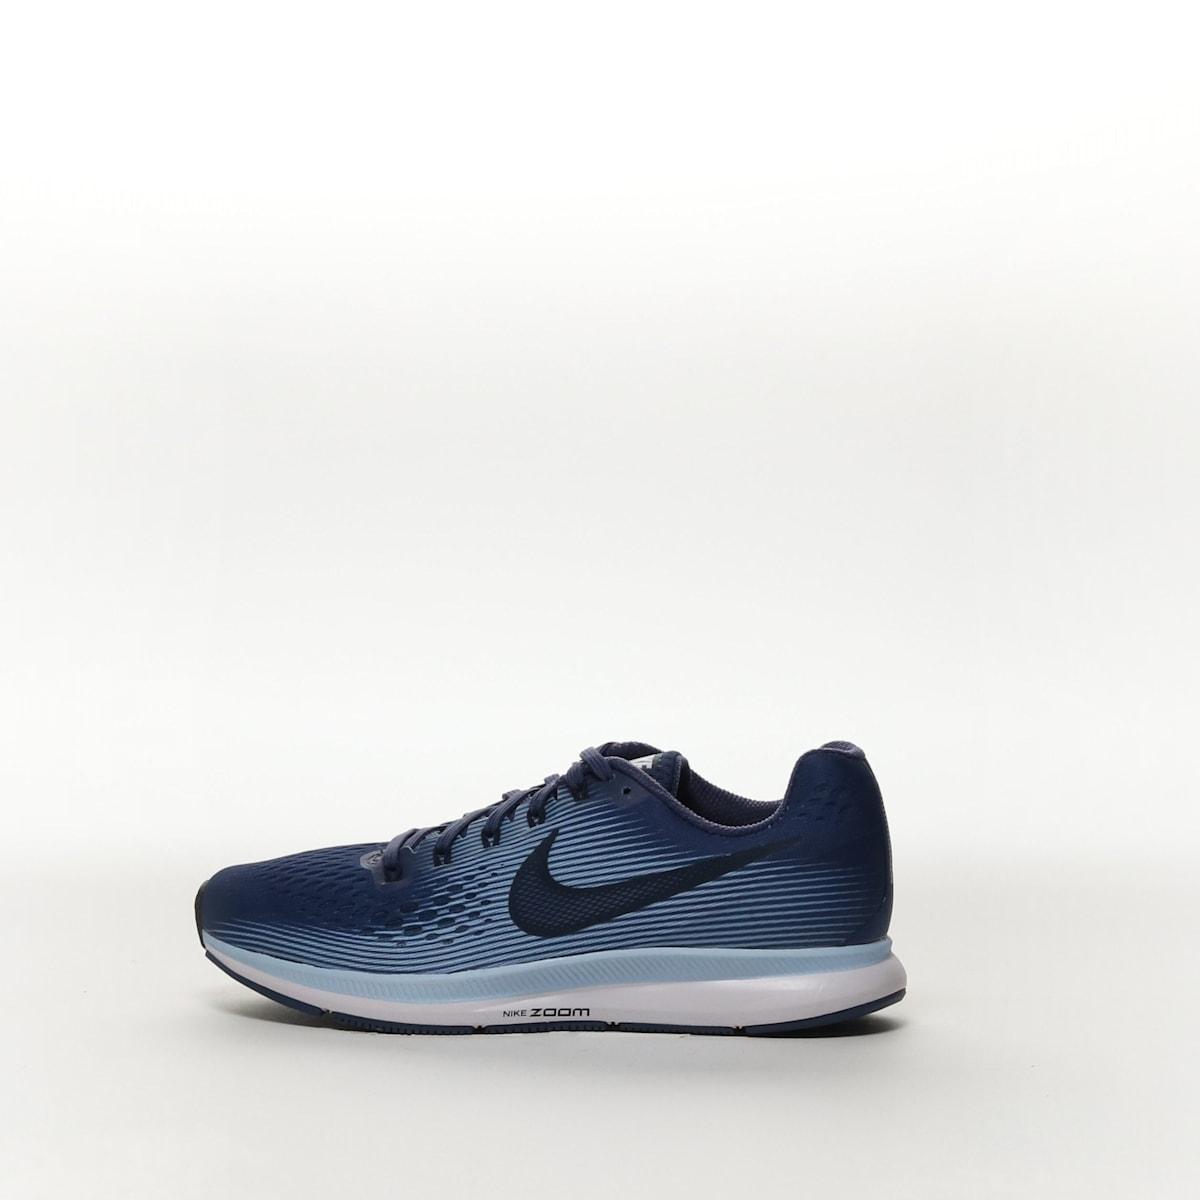 89f126382779f Nike Air Zoom Pegasus 34 - BLUE RECALL/ROYAL TINT/BLACK/OBSIDIAN – Resku